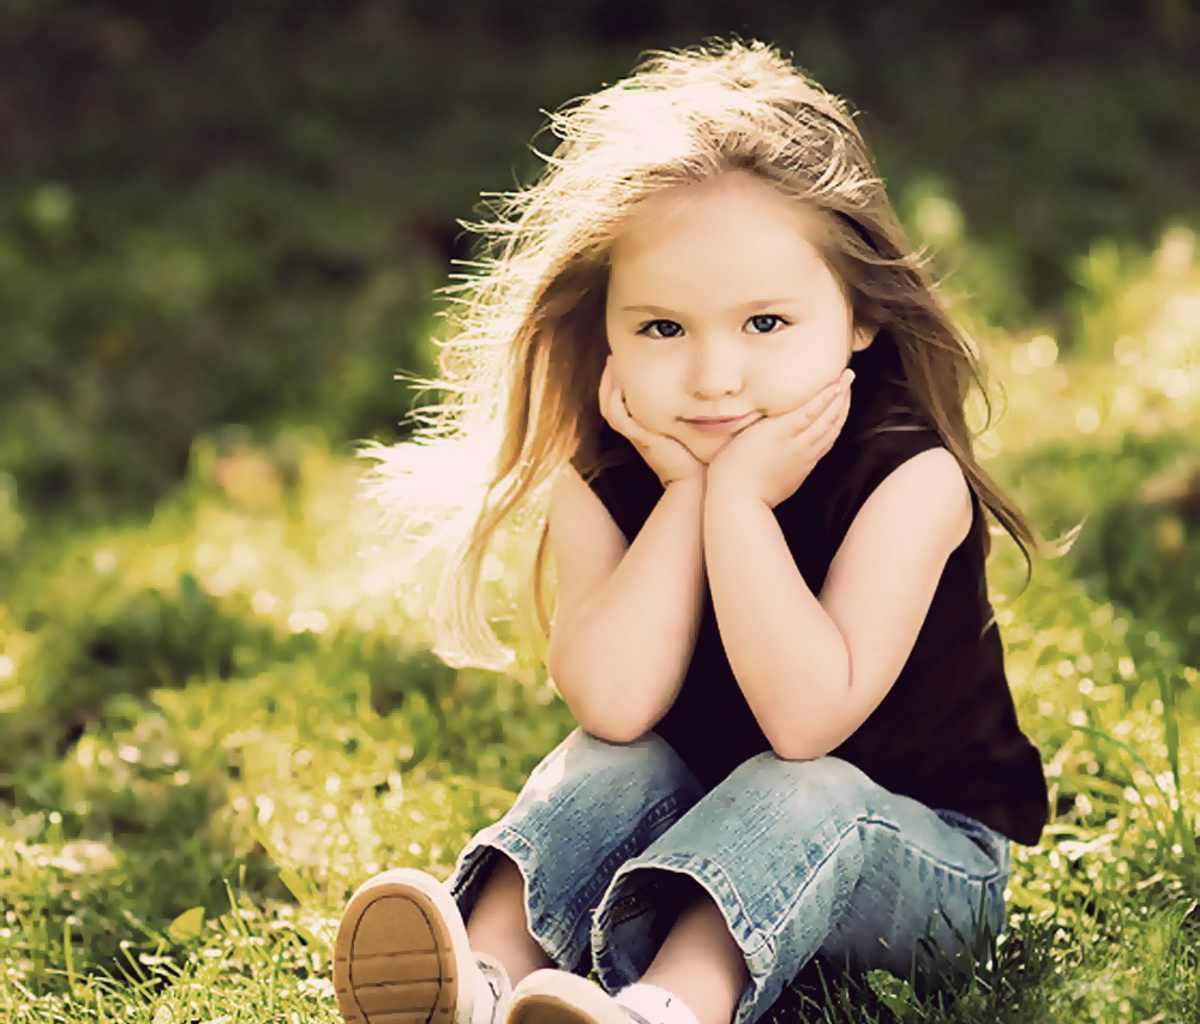 بالصور فتيات جميلات , صور بنات اطفال يجننوا 4374 12